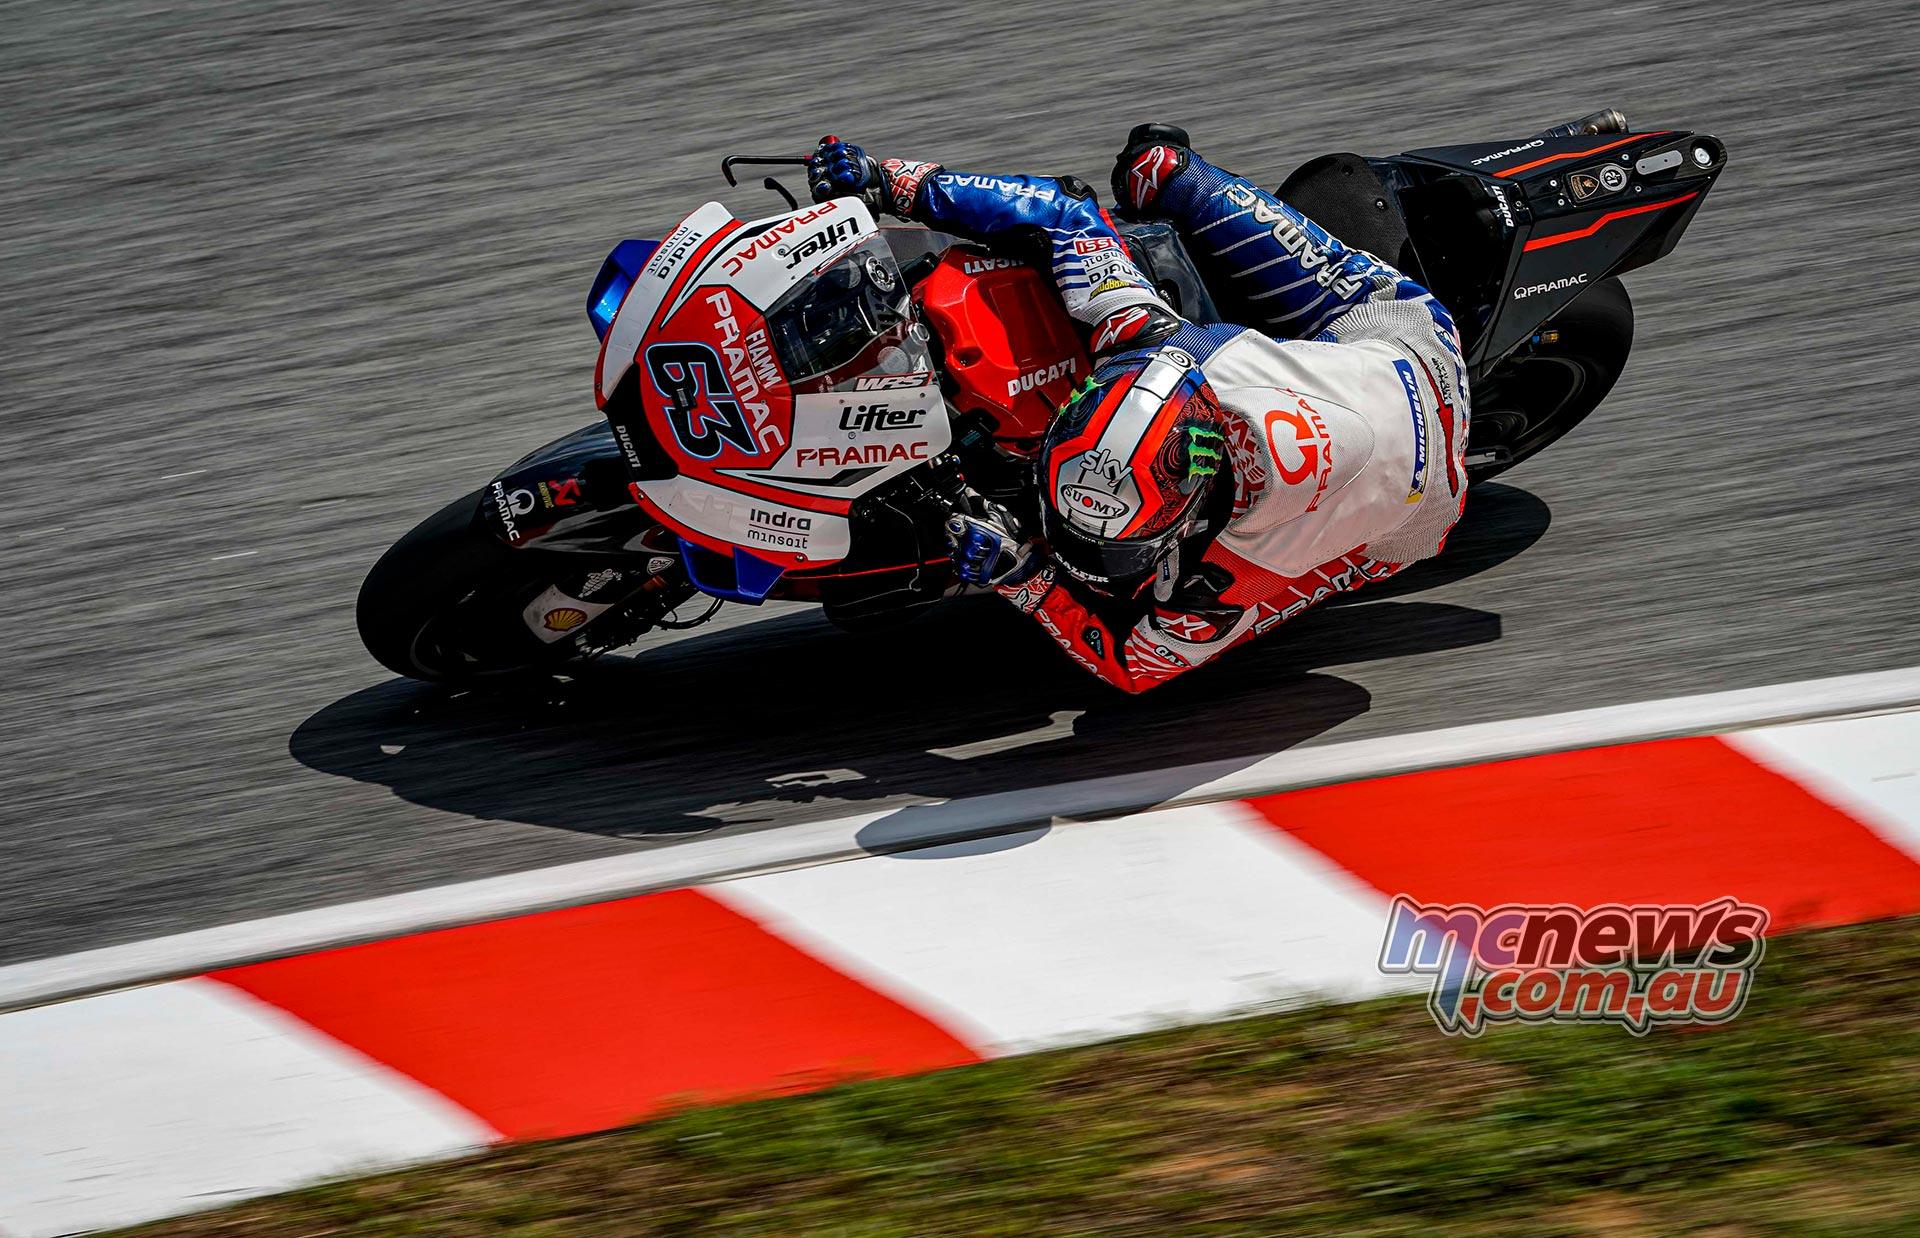 MotoGP Sepang Fri Bagnaia